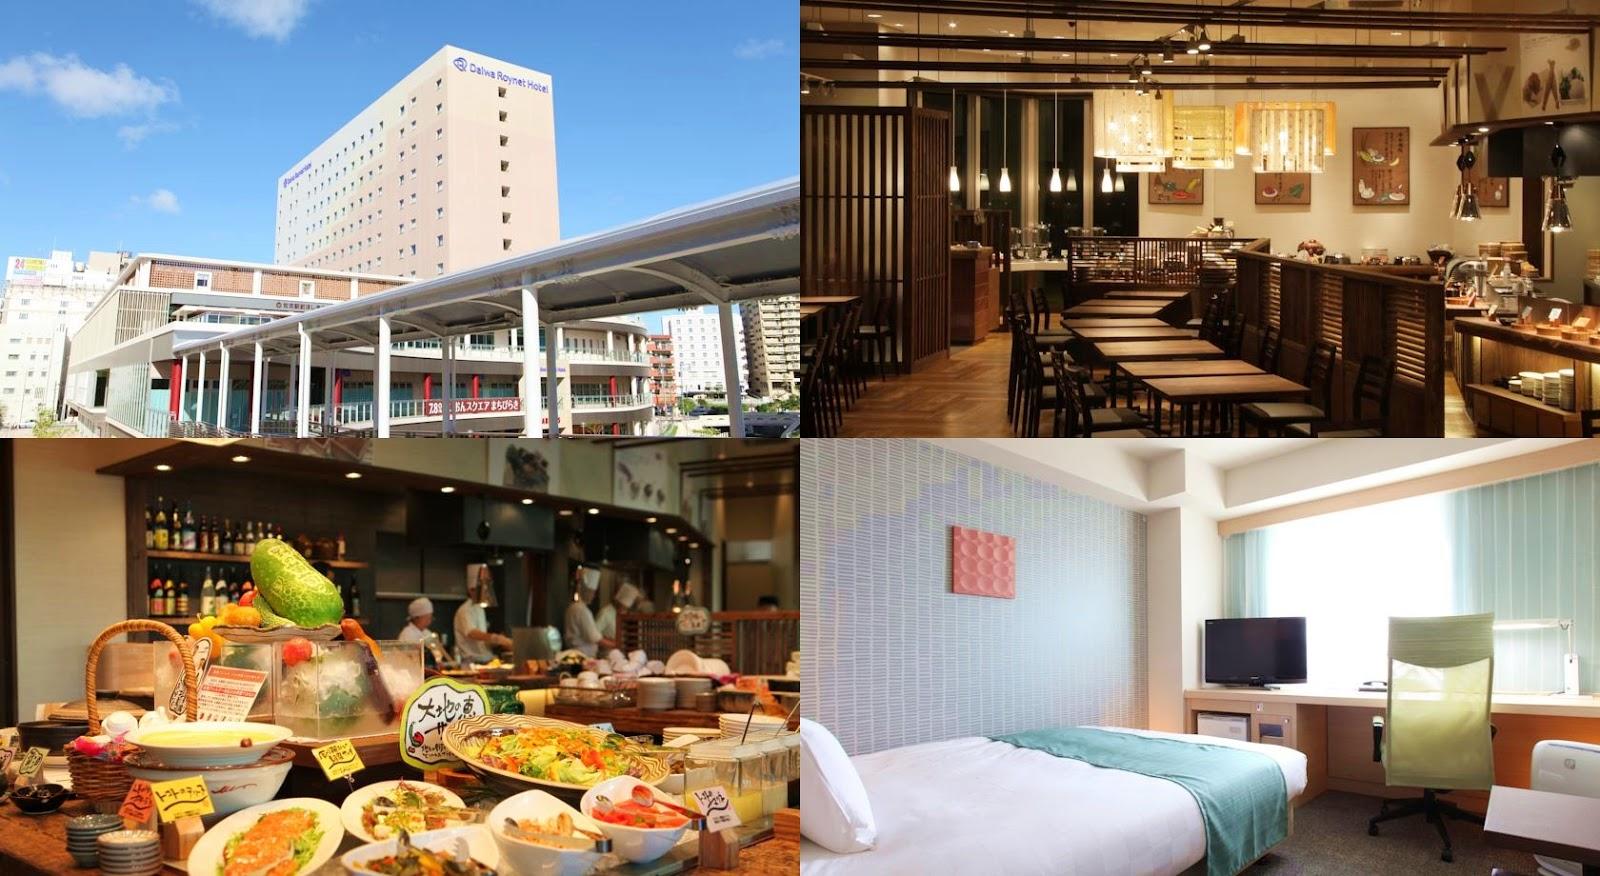 沖繩-住宿-推薦-那霸-國際通-大和ROYNET酒店-Daiwa-Roynet-Hotel-Naha-Kokusaidori-Okinawa-hotel-recommendation